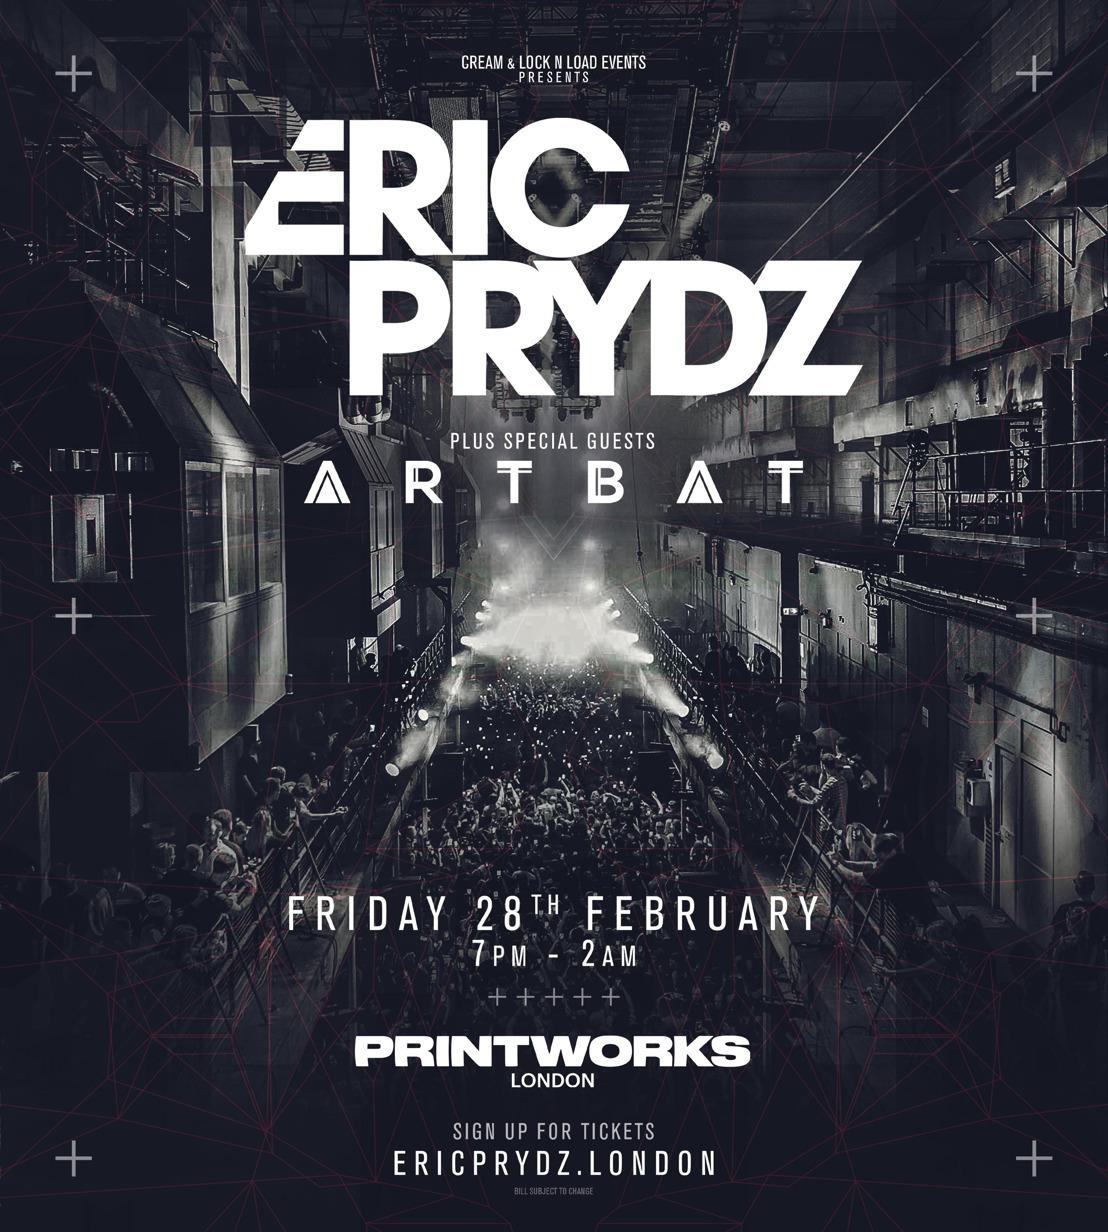 Cream & Lock N Load Events Presents Eric Prydz w/ Artbat Feb 28th 2020 at Printworks London